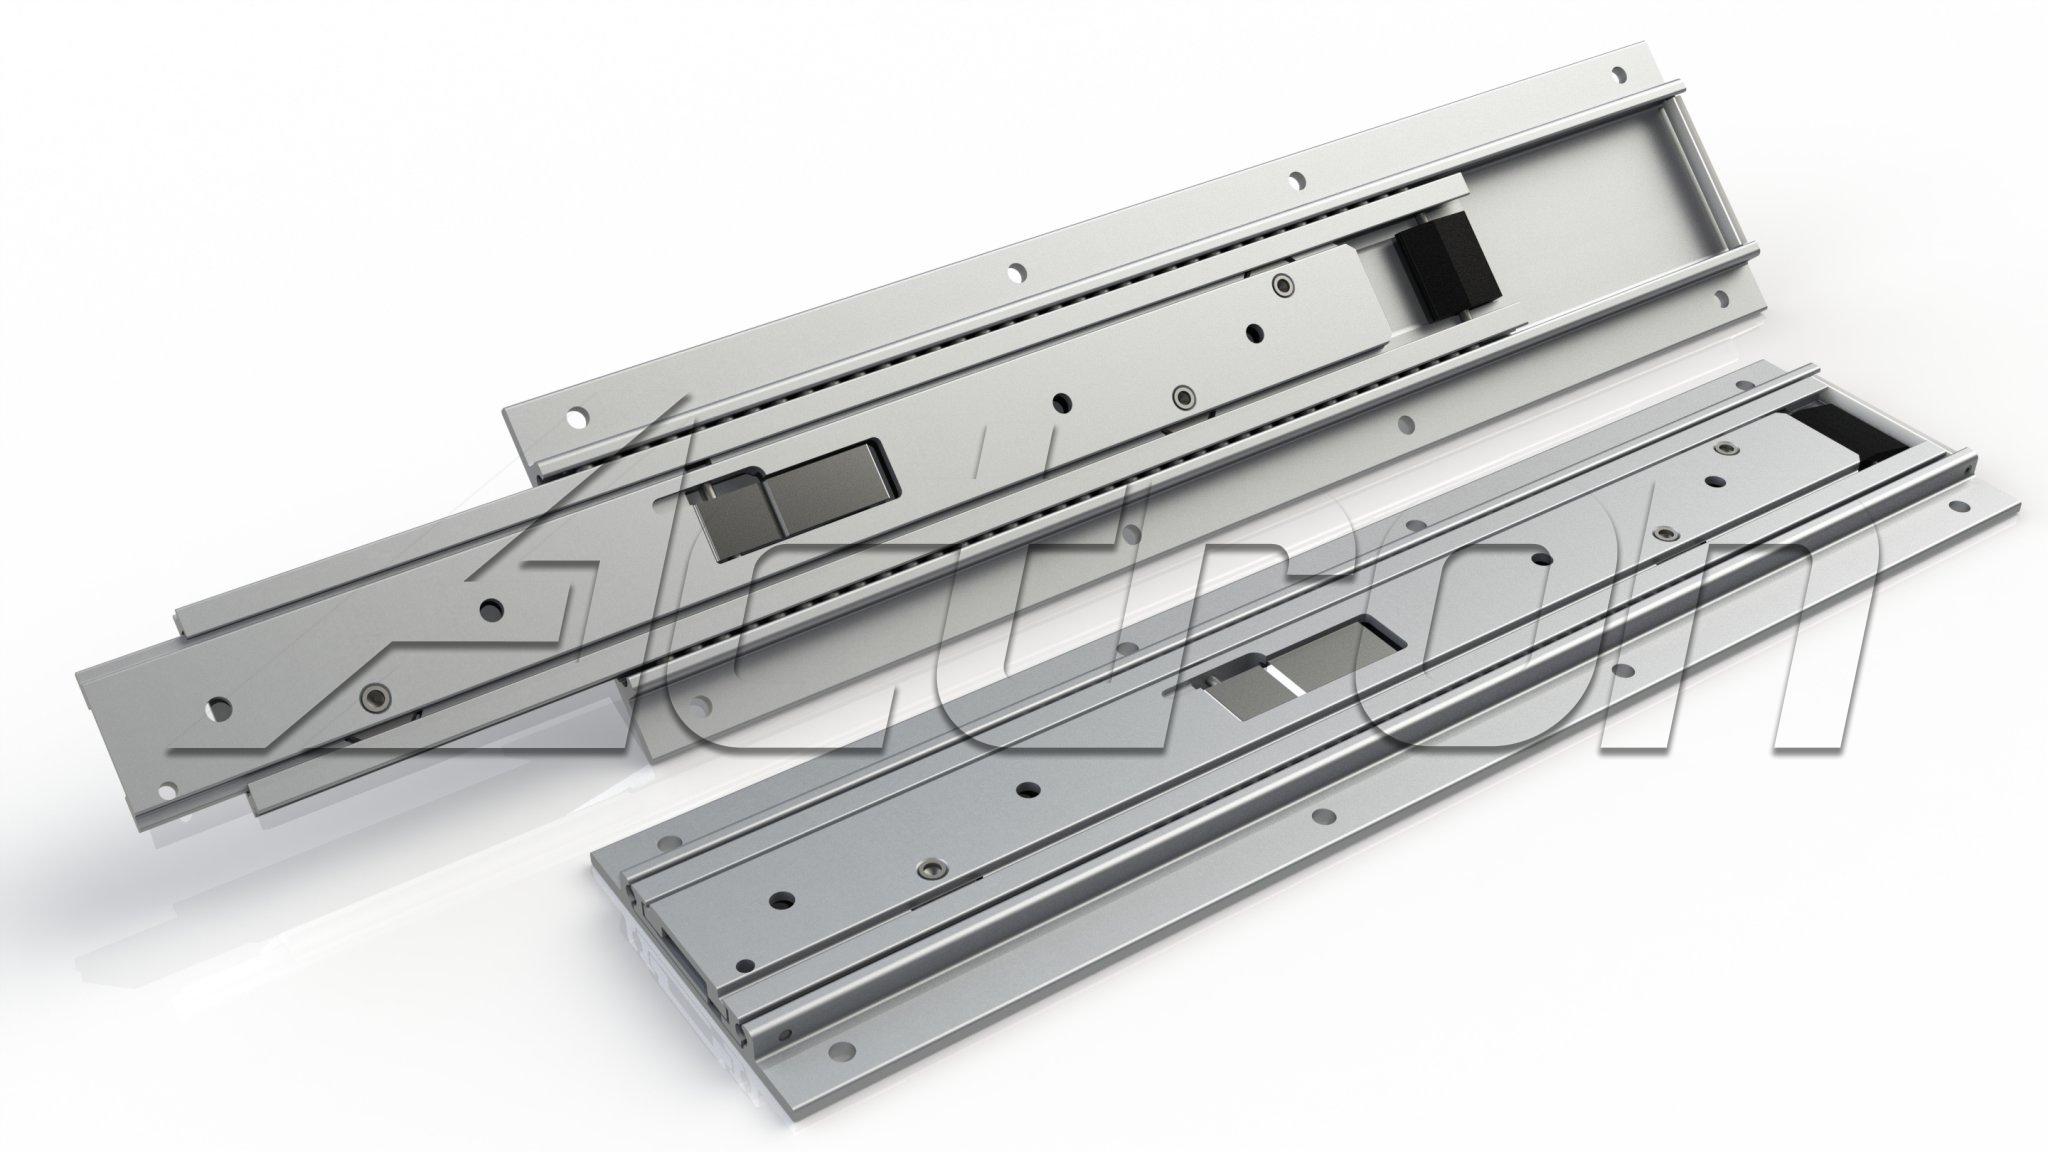 slide-assy-w-flange-8211-aluminum-38-8243-x-2-88-8243-5118-a5350.jpg